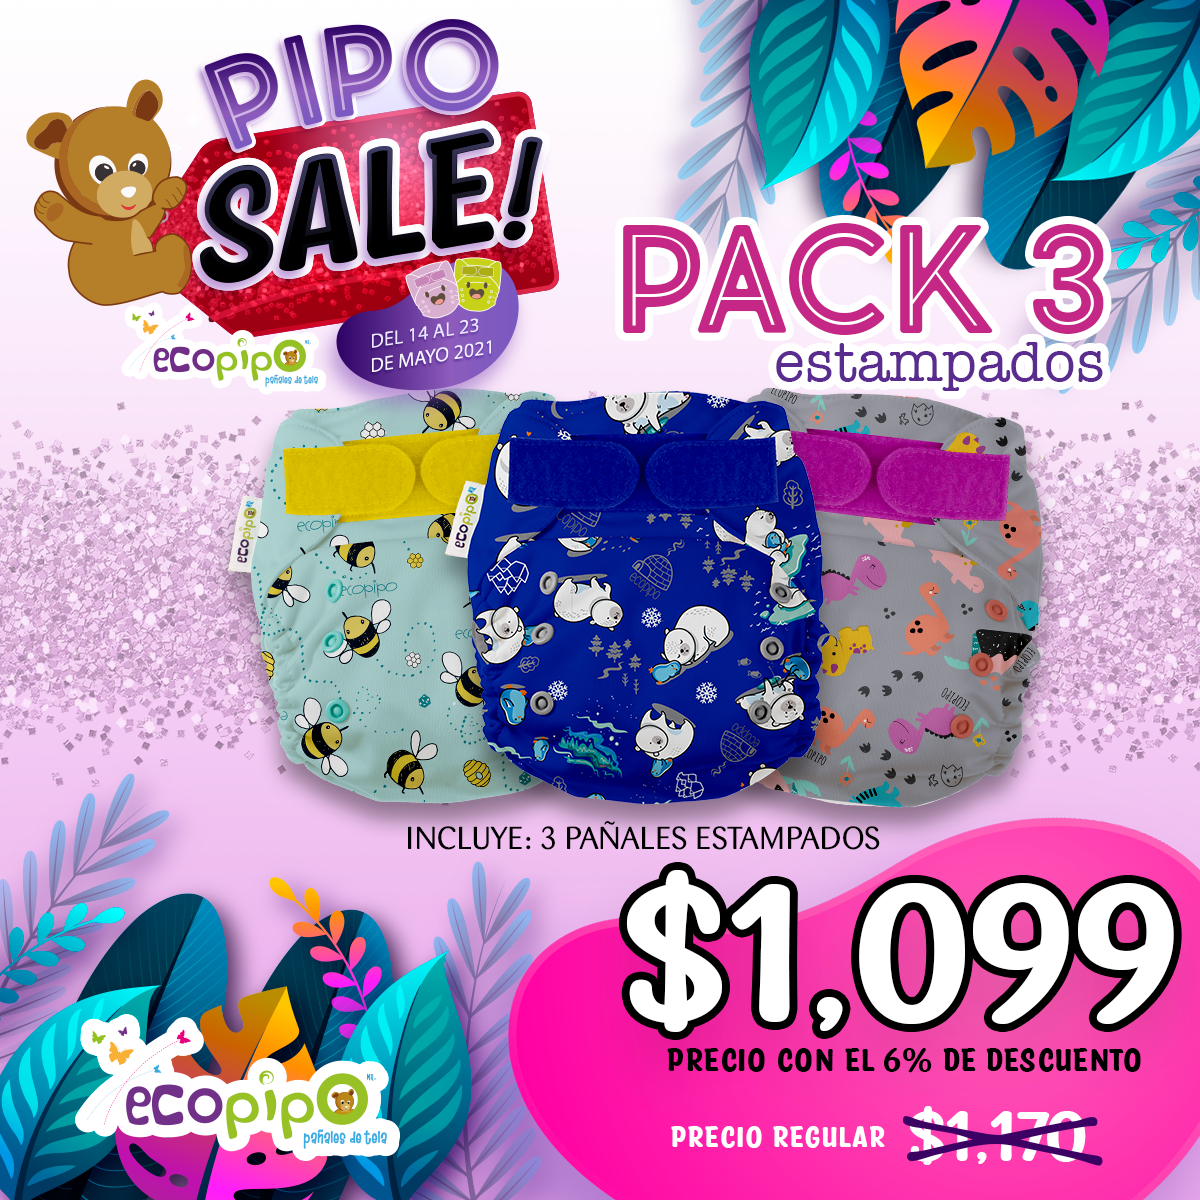 PACK3-pipoSale-estampados